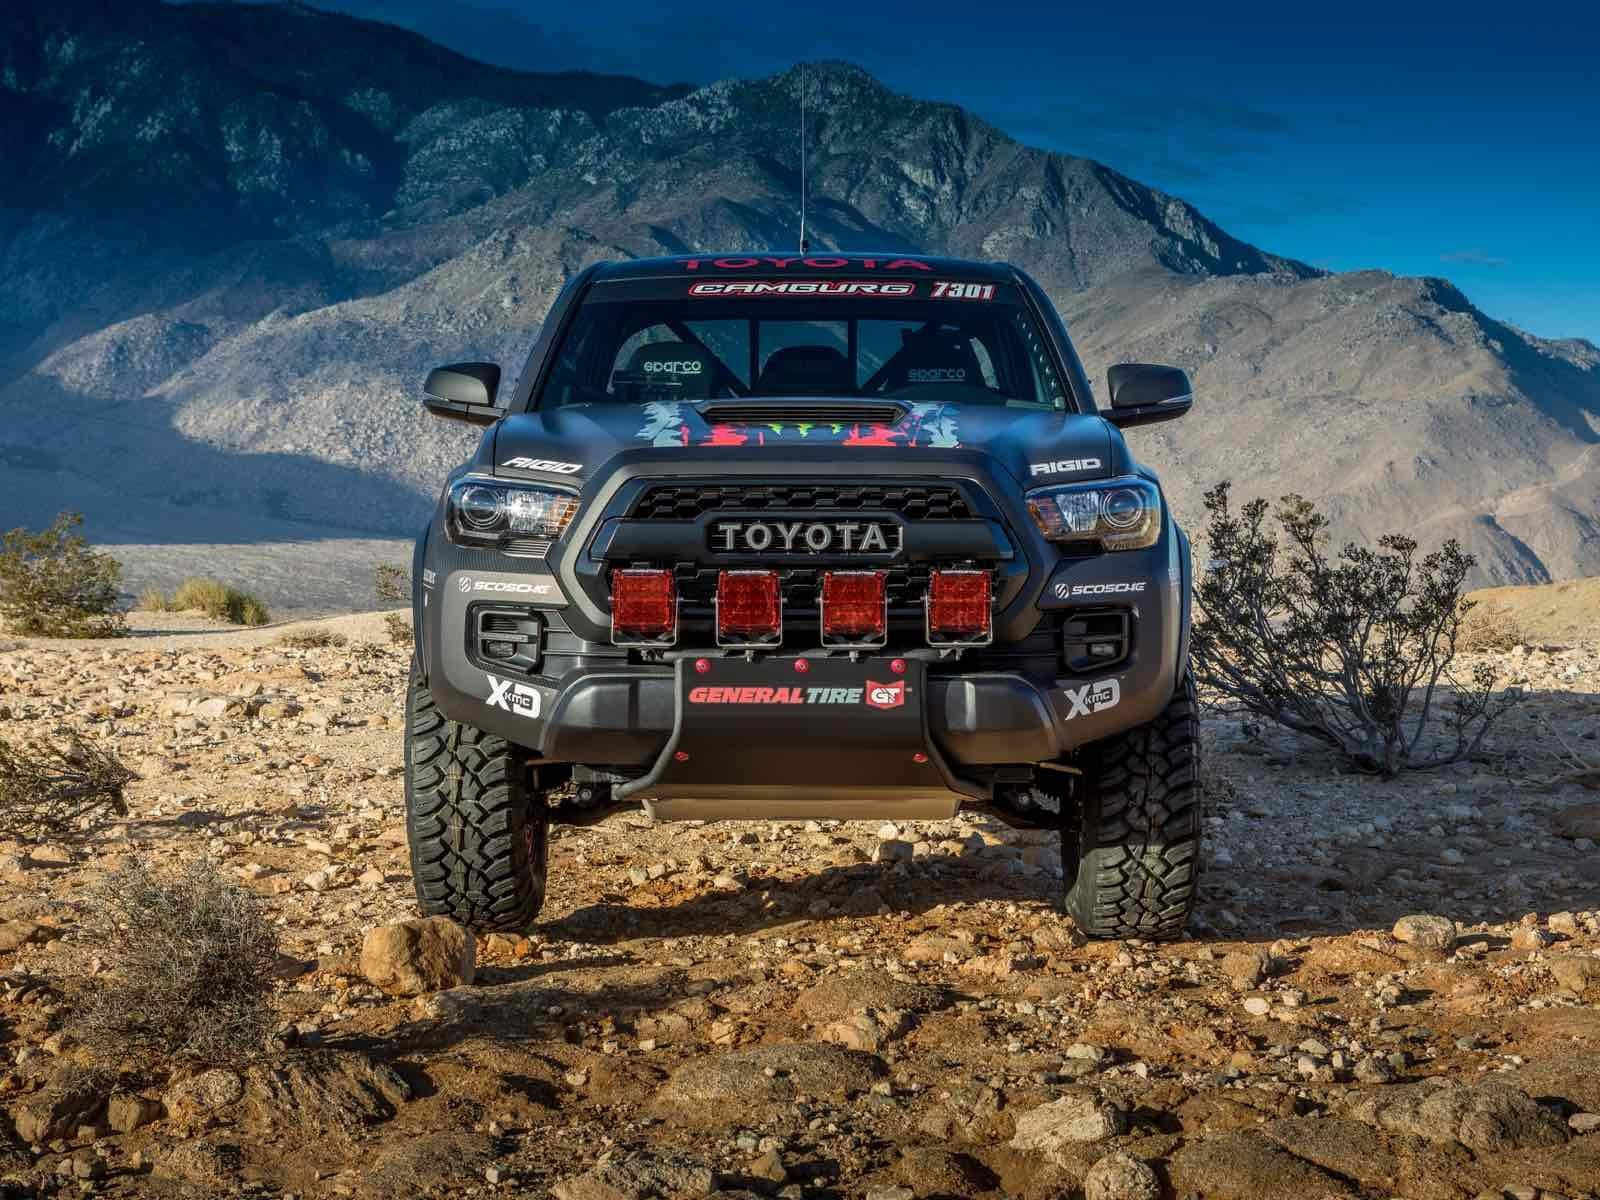 Toyota Tacoma Trd Pro Race Truck 100 Por Ciento Rudo